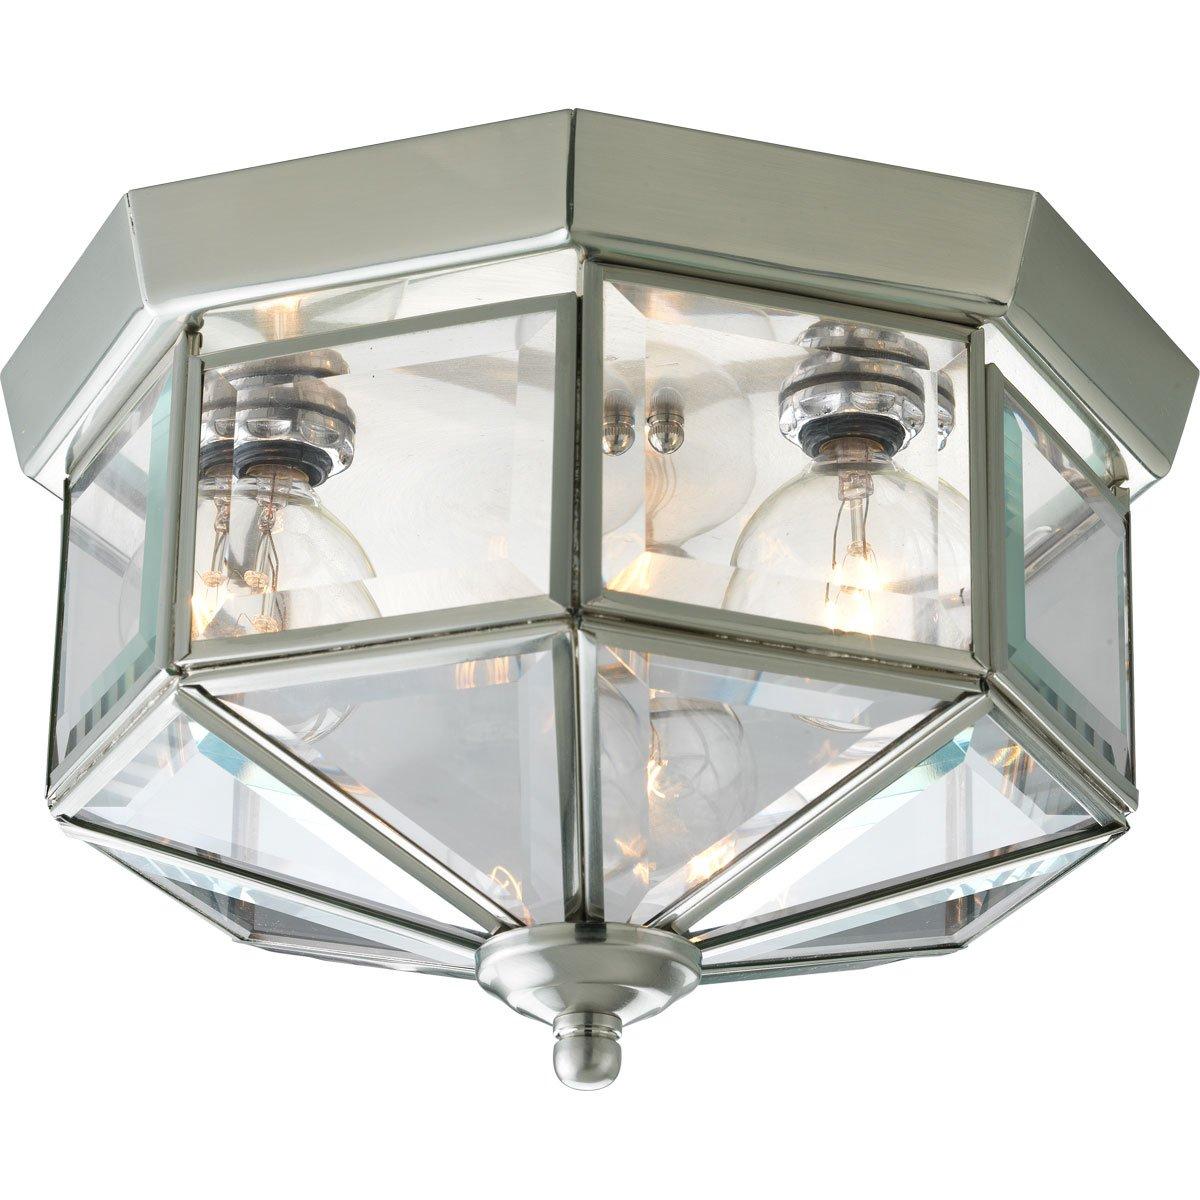 brushed nickel flush mount light modern progress lighting p578809 octagonal closetoceiling fixture with clear bound beveled glass brushed nickel hall light ceiling amazoncom